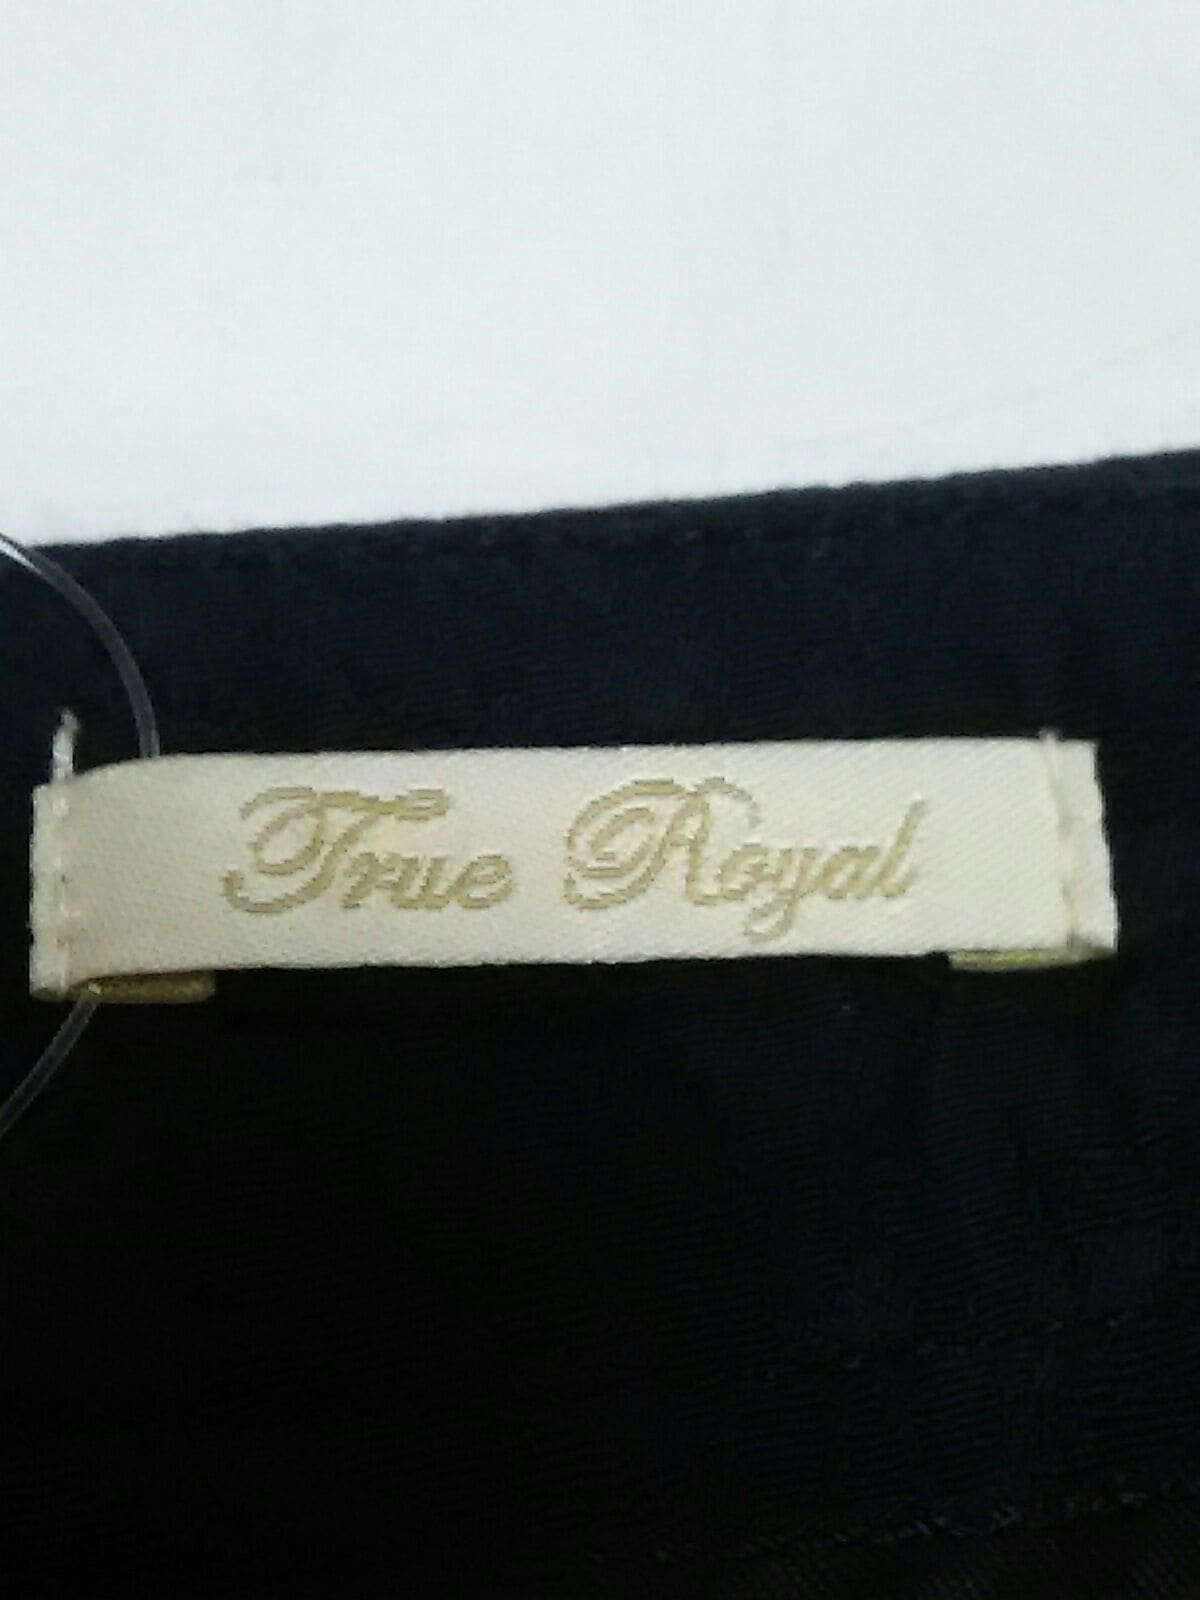 True Royal(トゥルーロイヤル)のパンツ